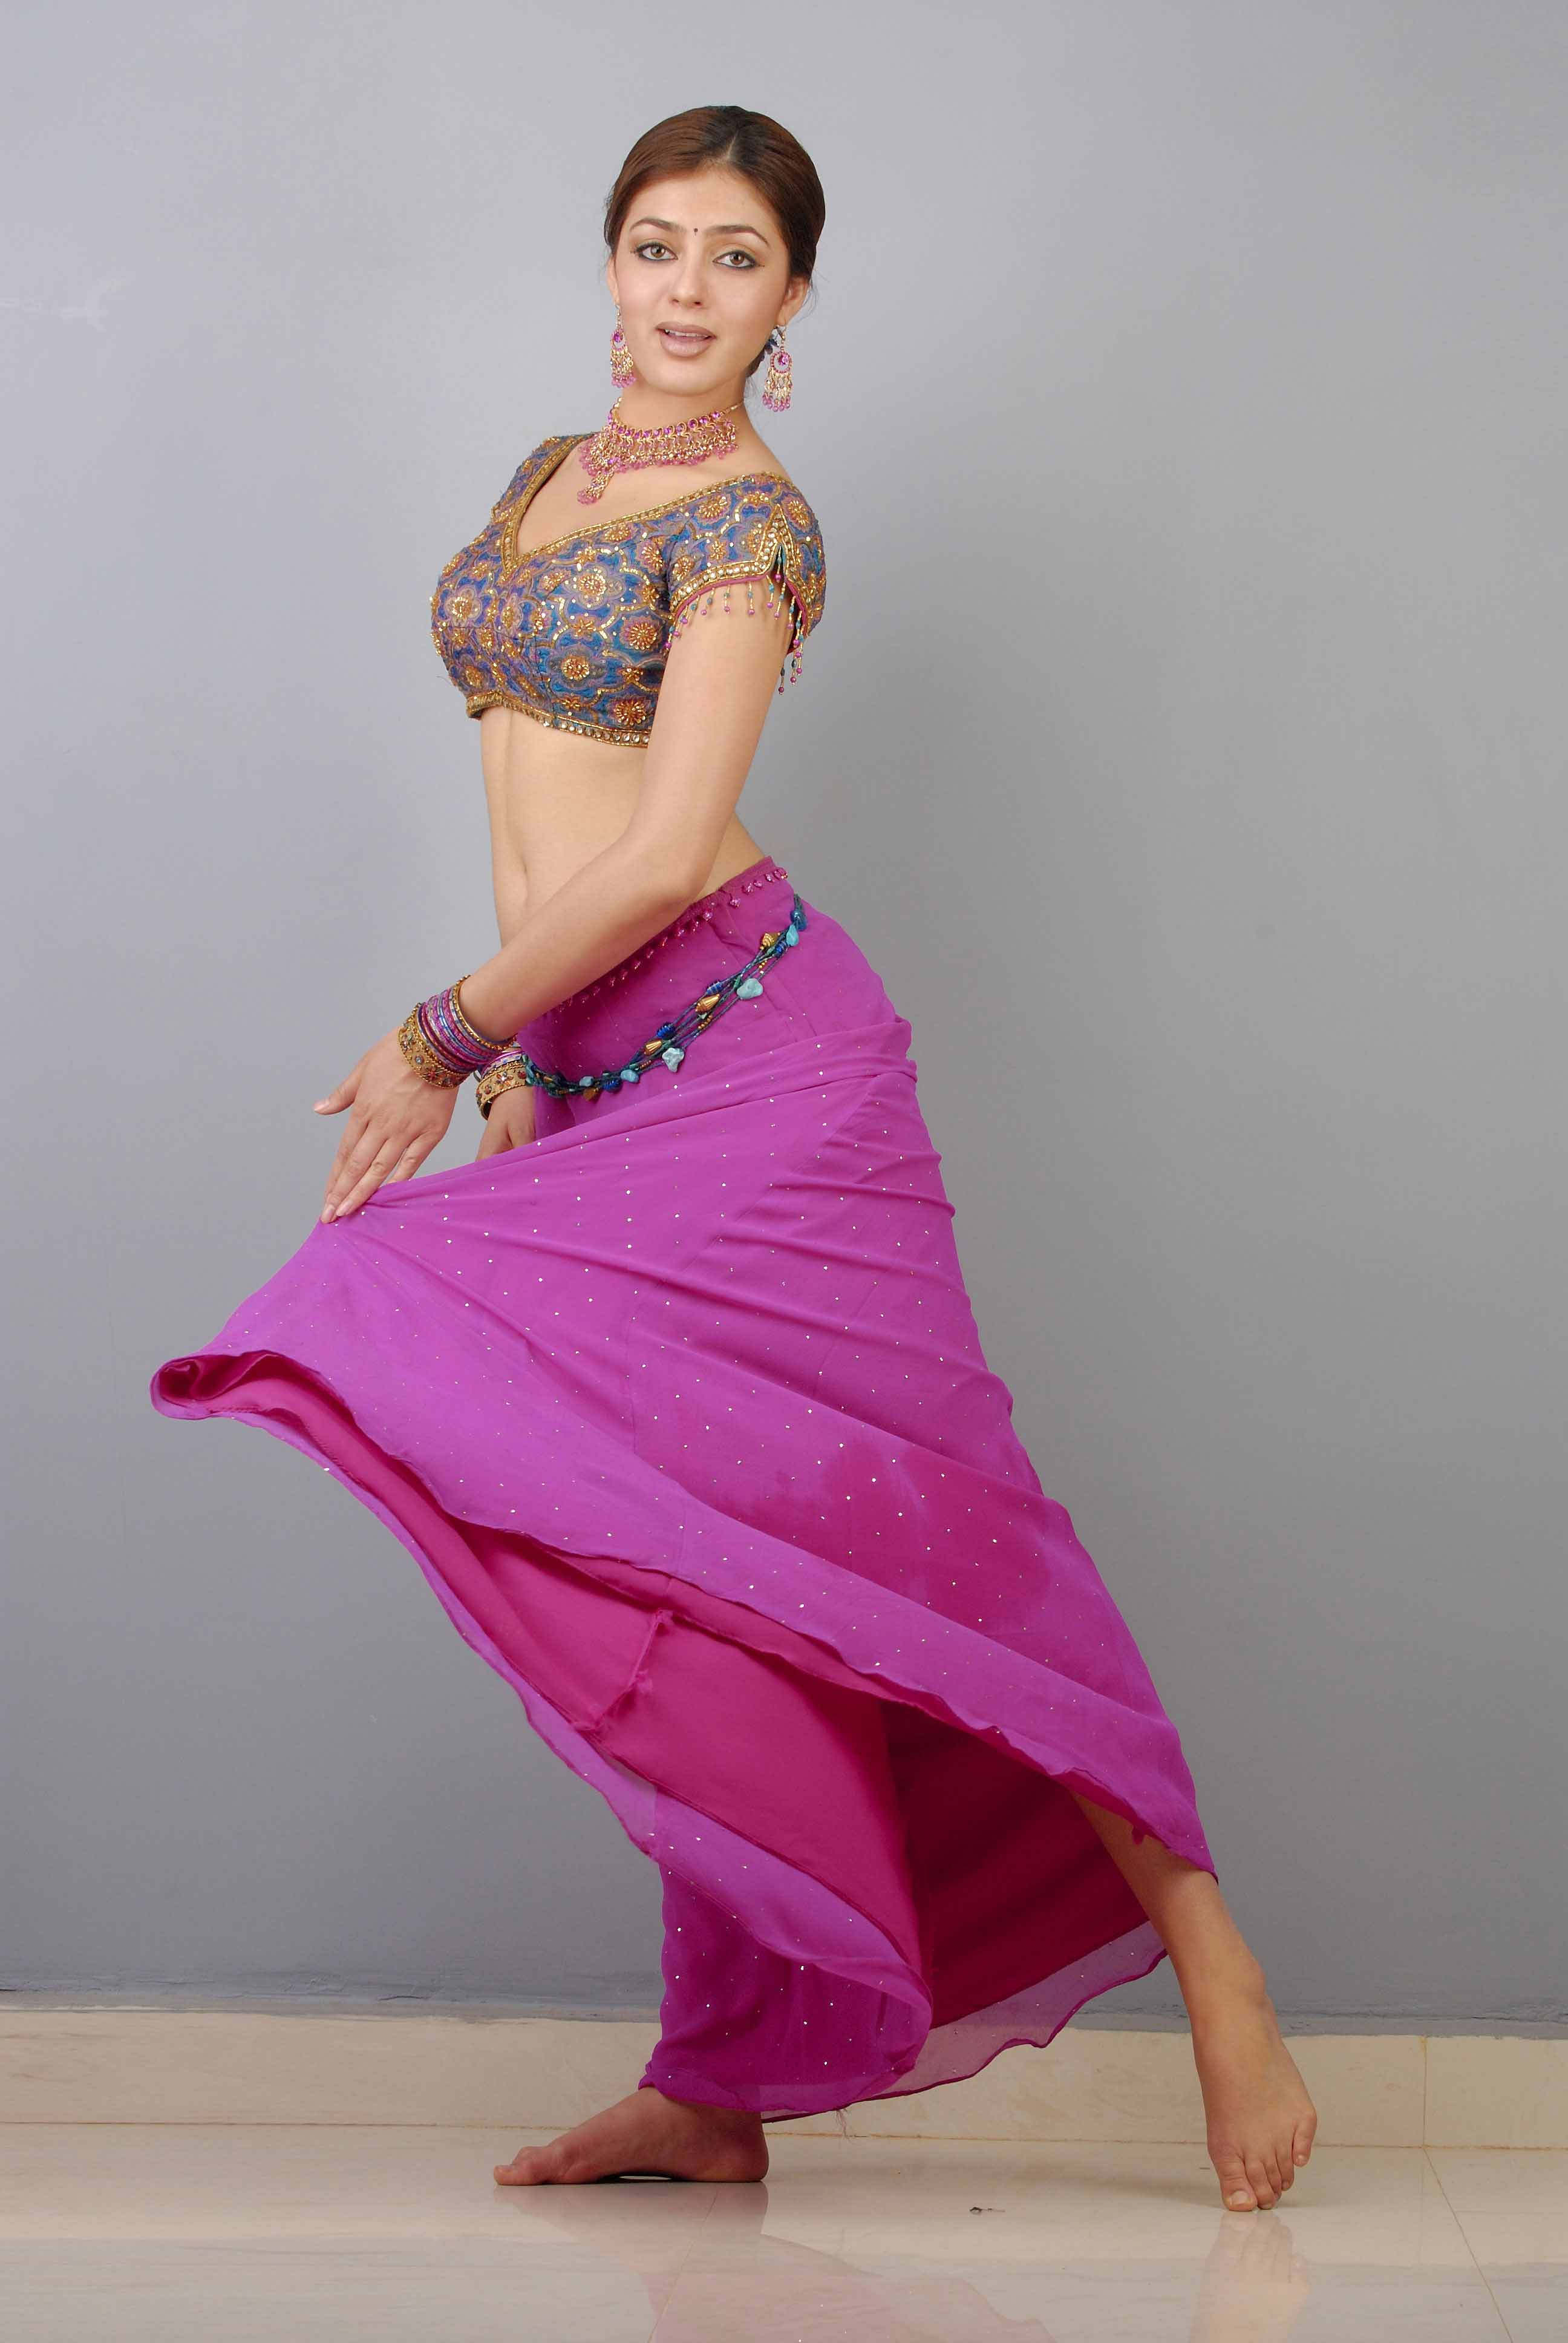 https://pics.wikifeet.com/Parvati-Melton-Feet-828108.jpg